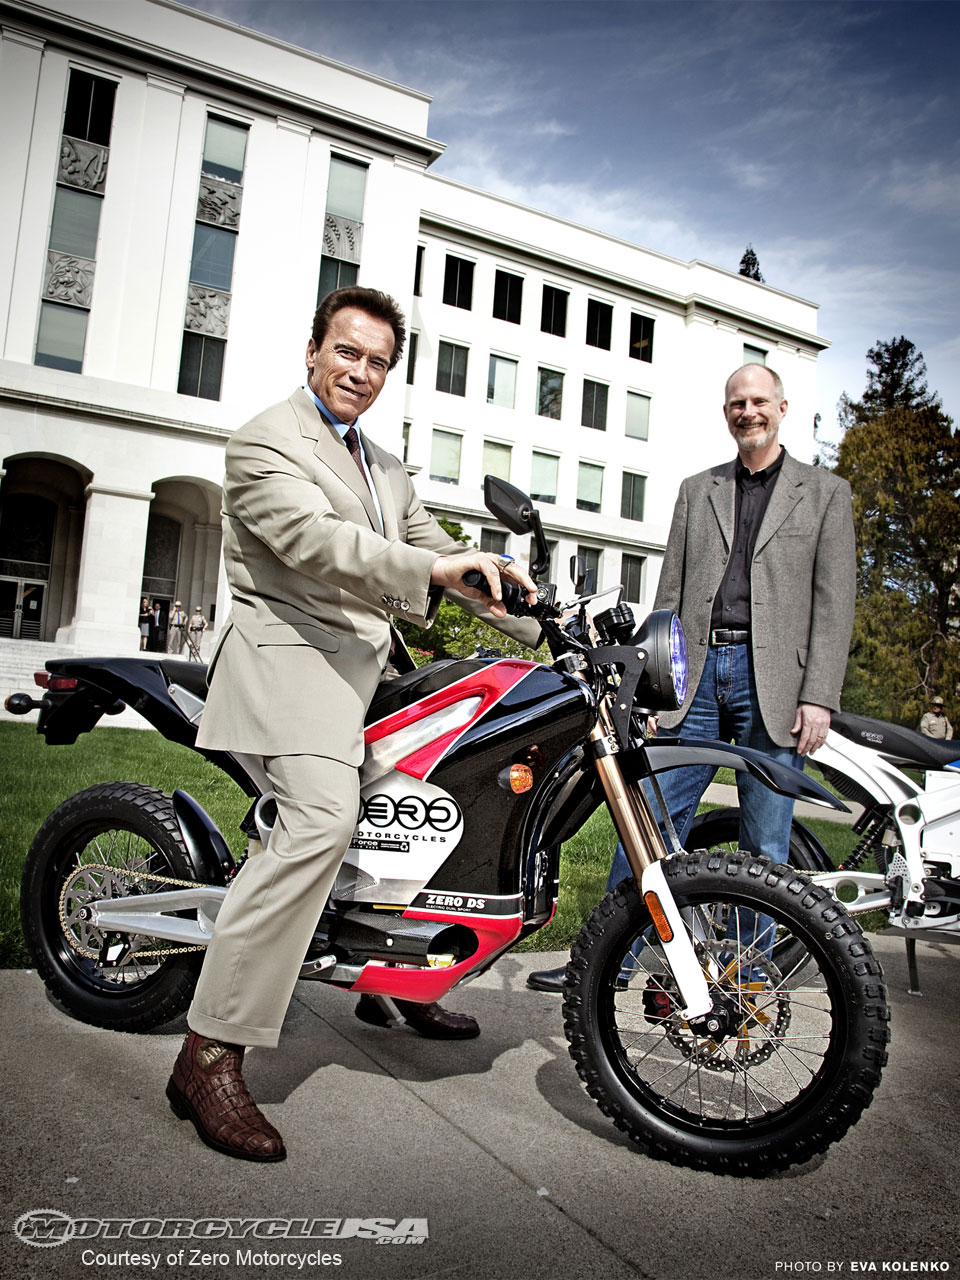 Шварценеггера признали Мотоциклистом года 2010